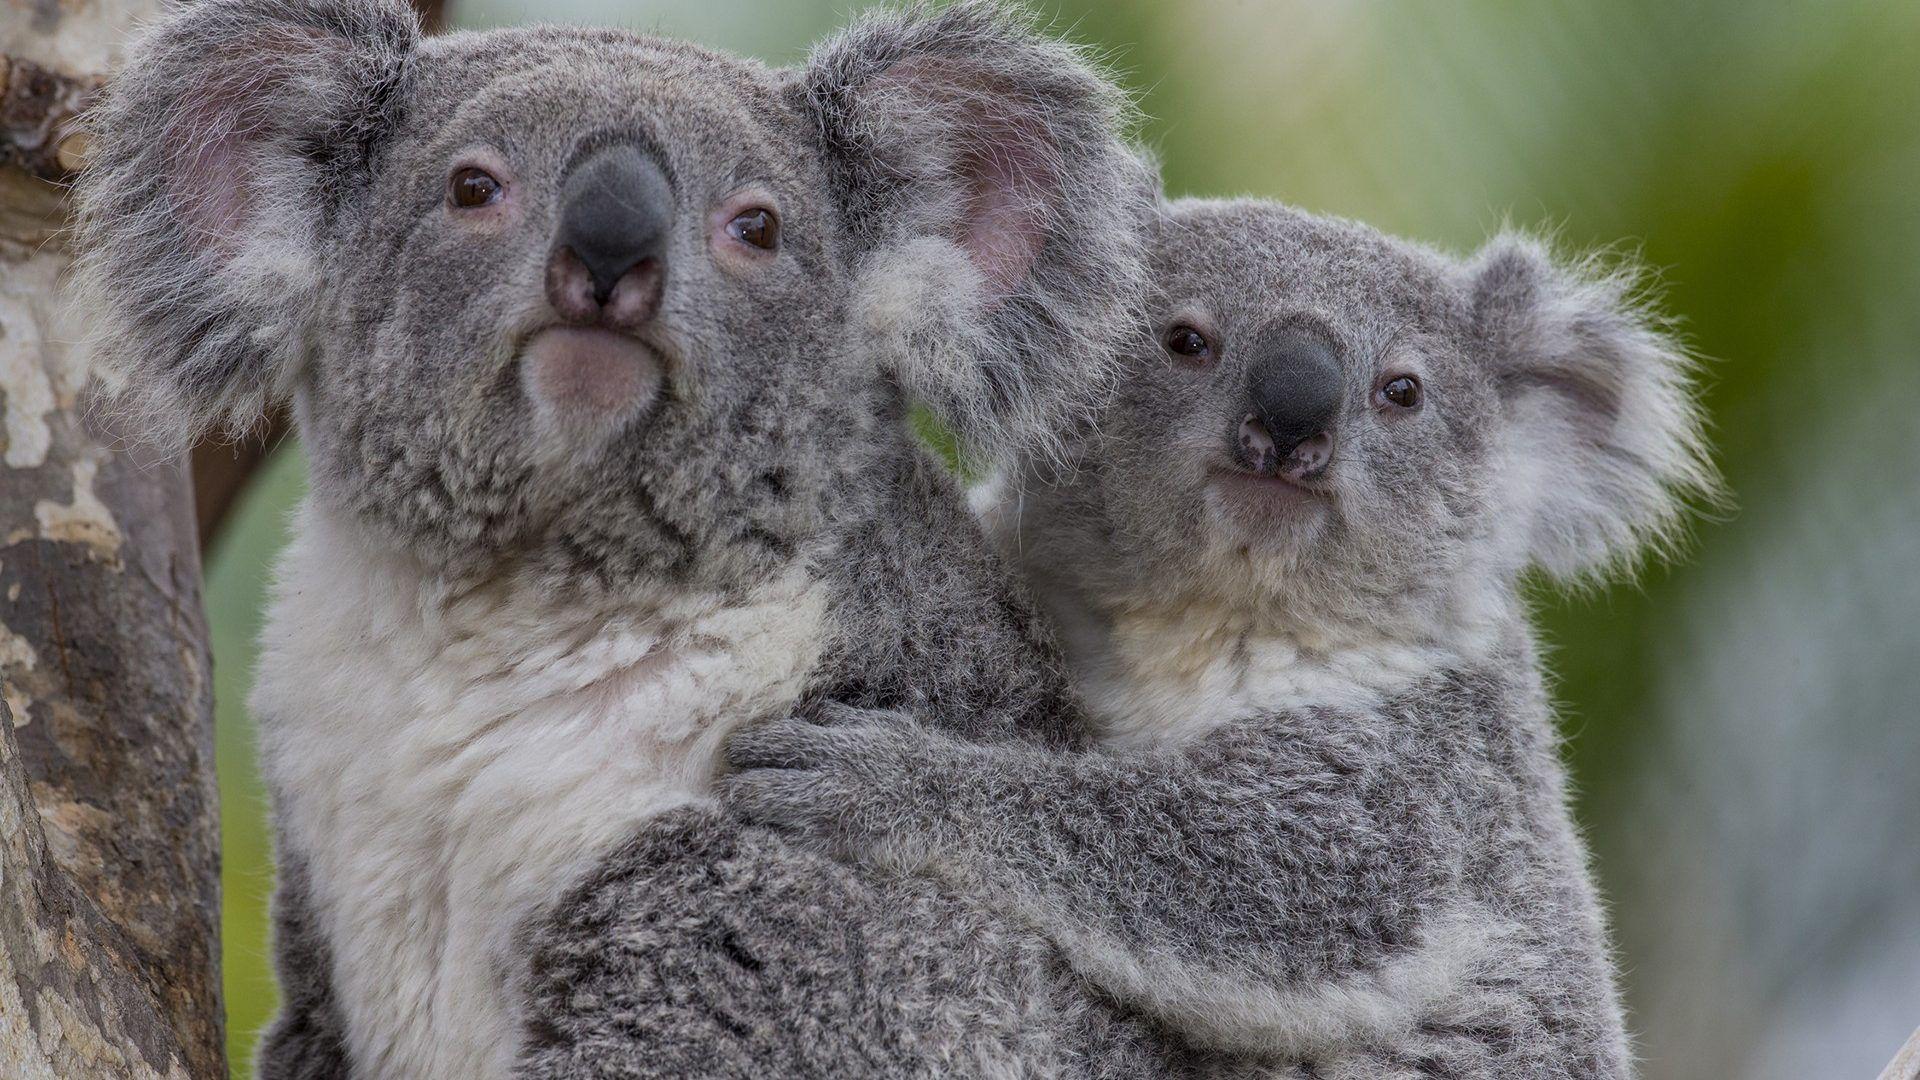 The Family Of Koalas